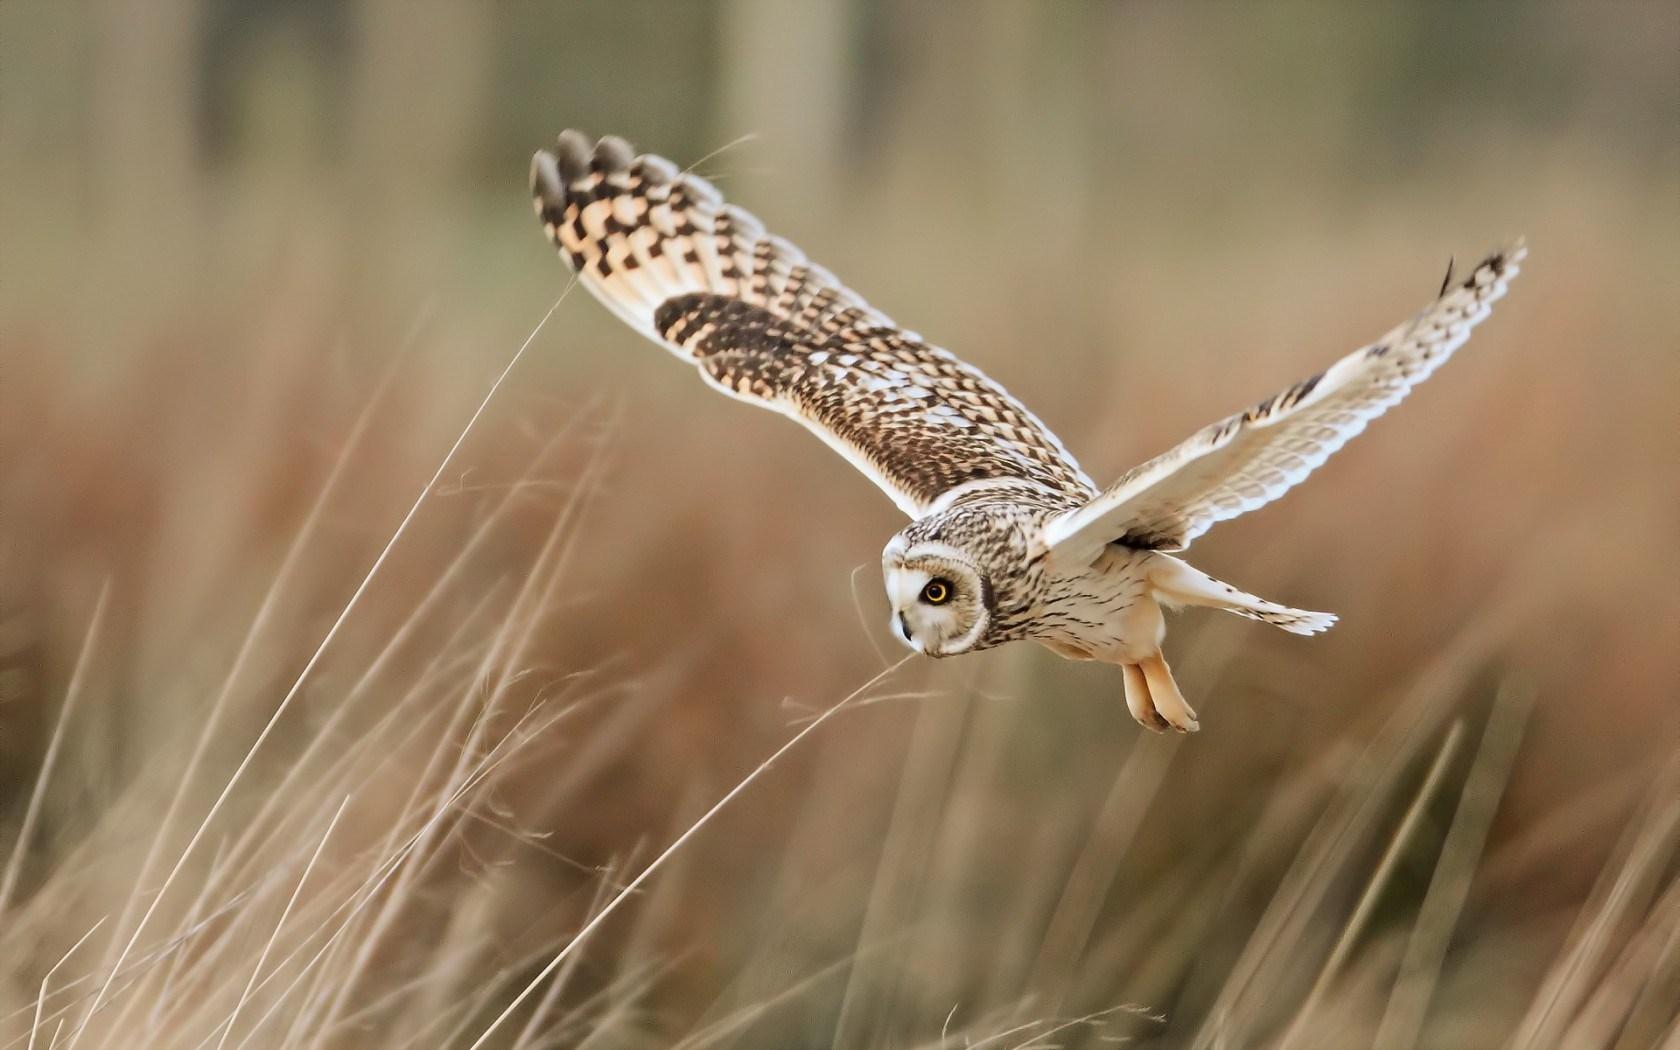 Field Bird Owl Flying